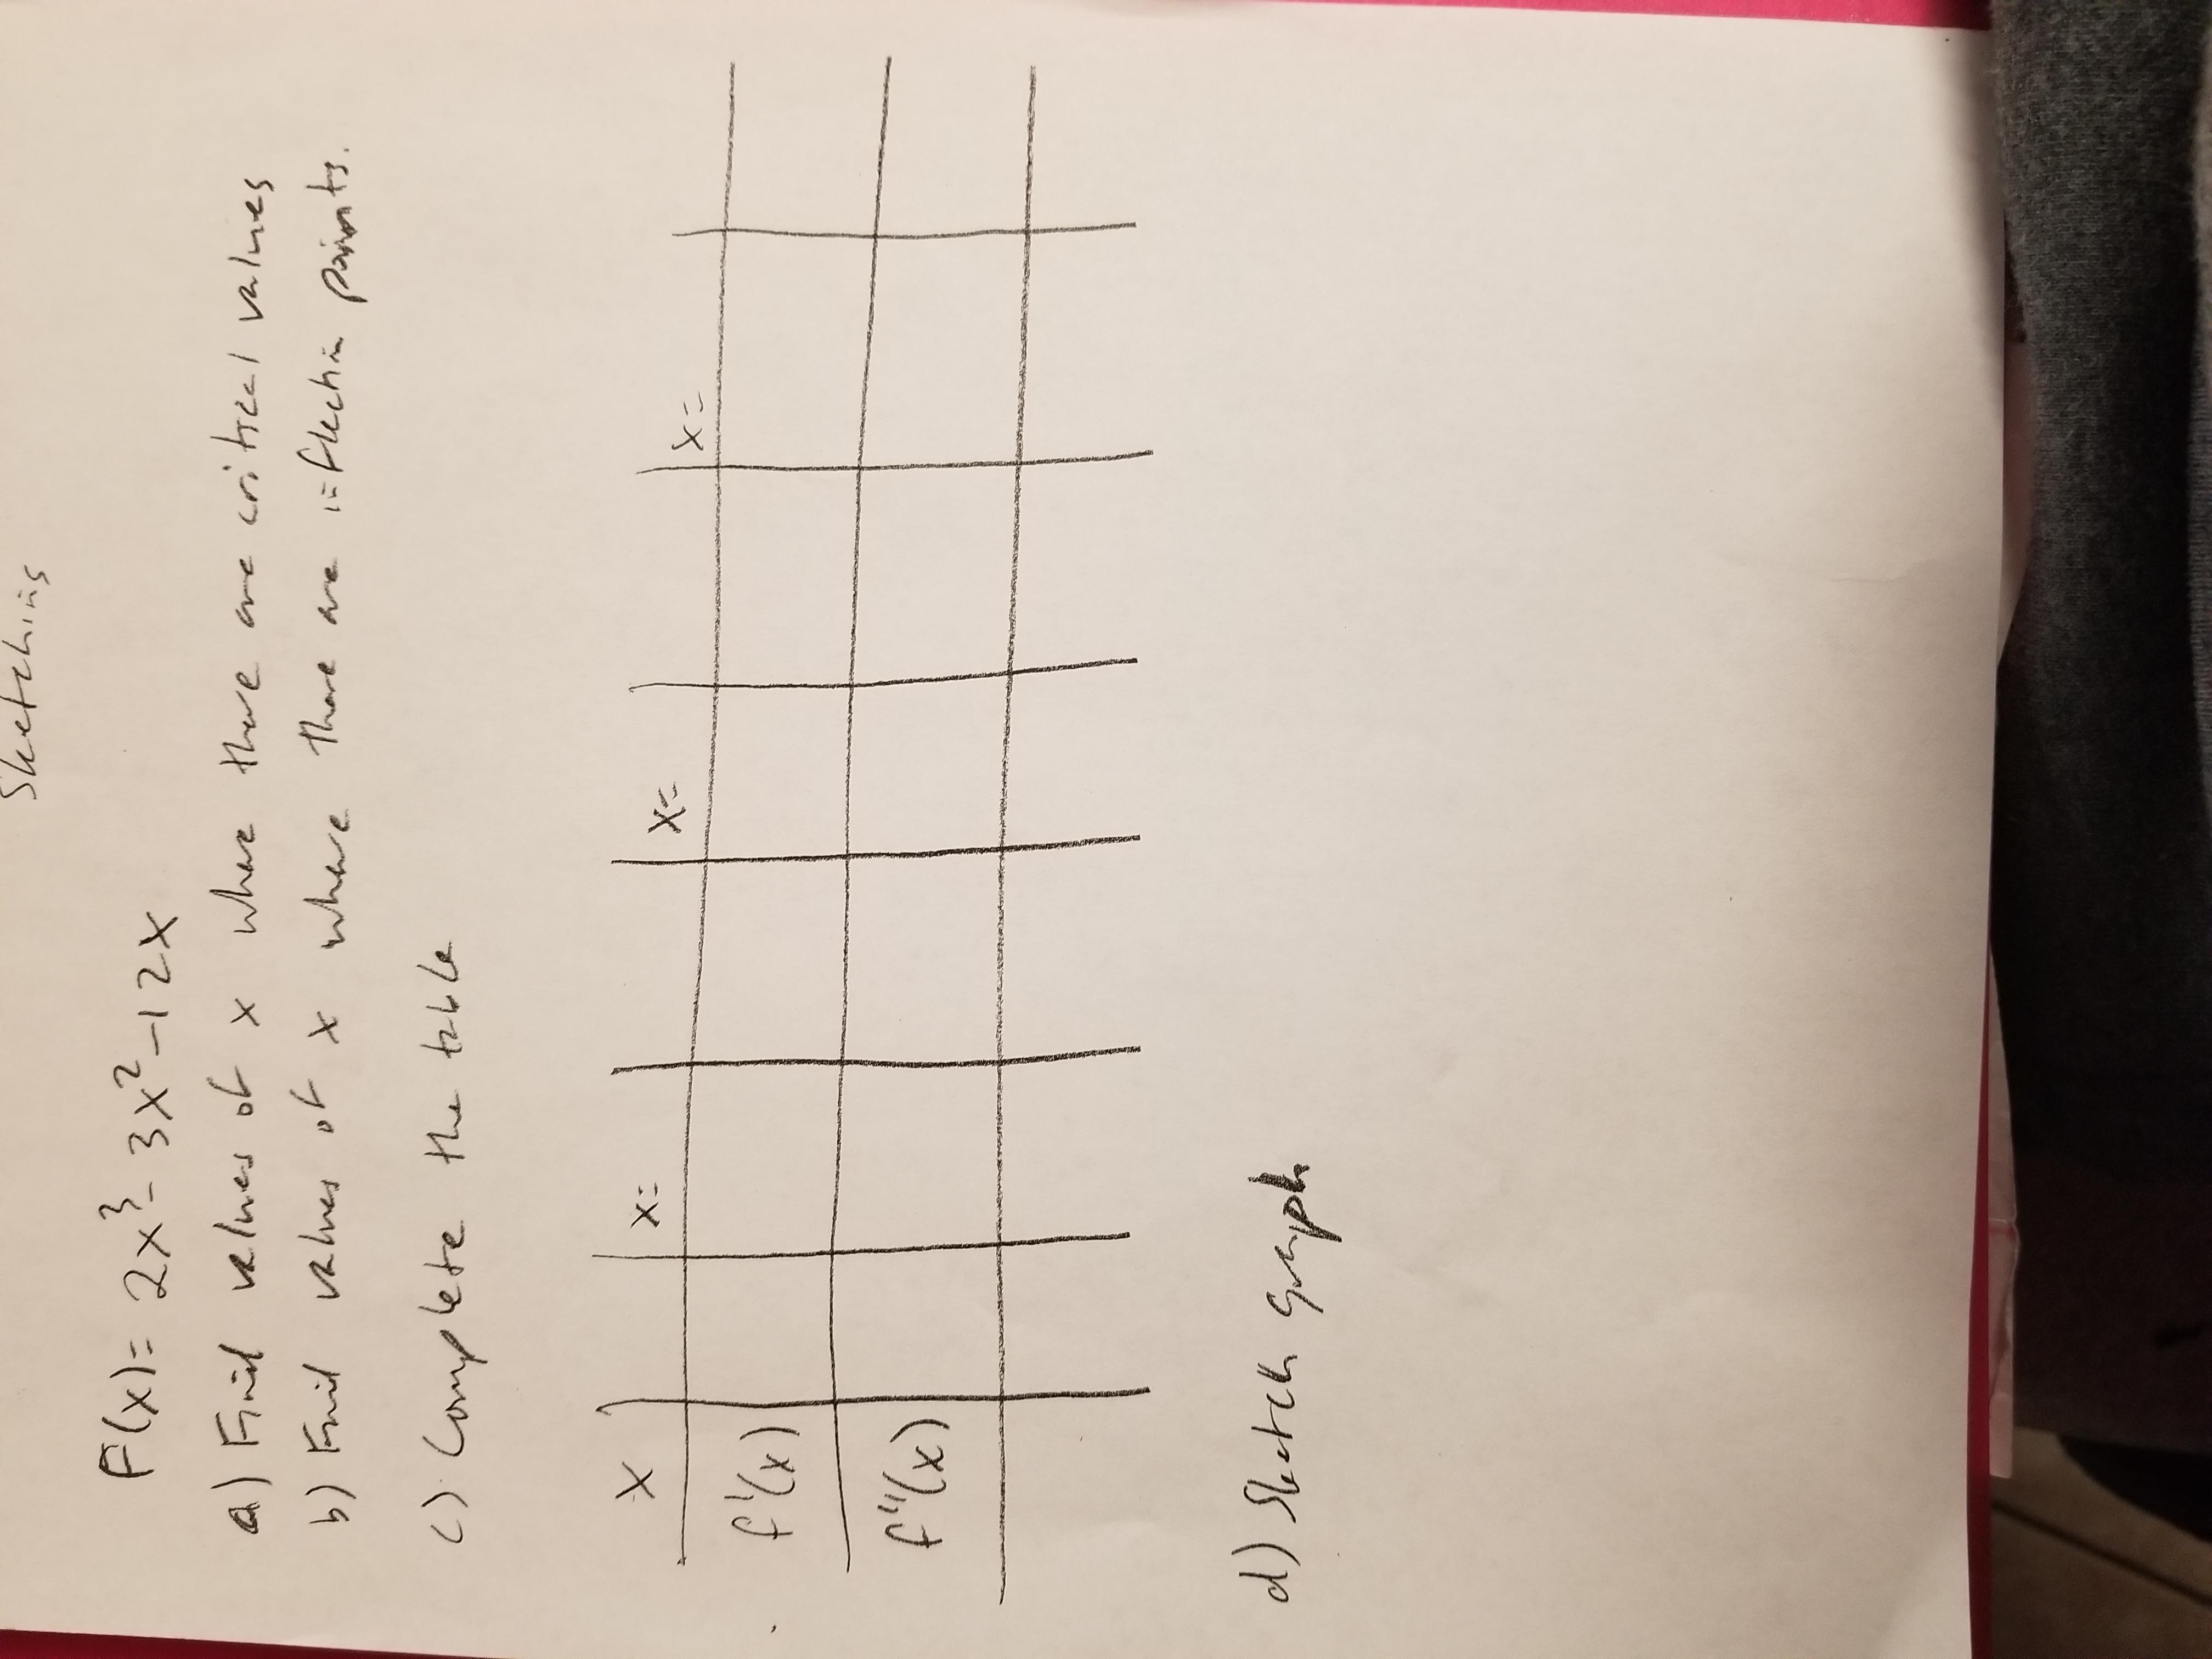 "Fx): 2x 3x2-12x e e r he values X- Xc r'o) с""(%)"